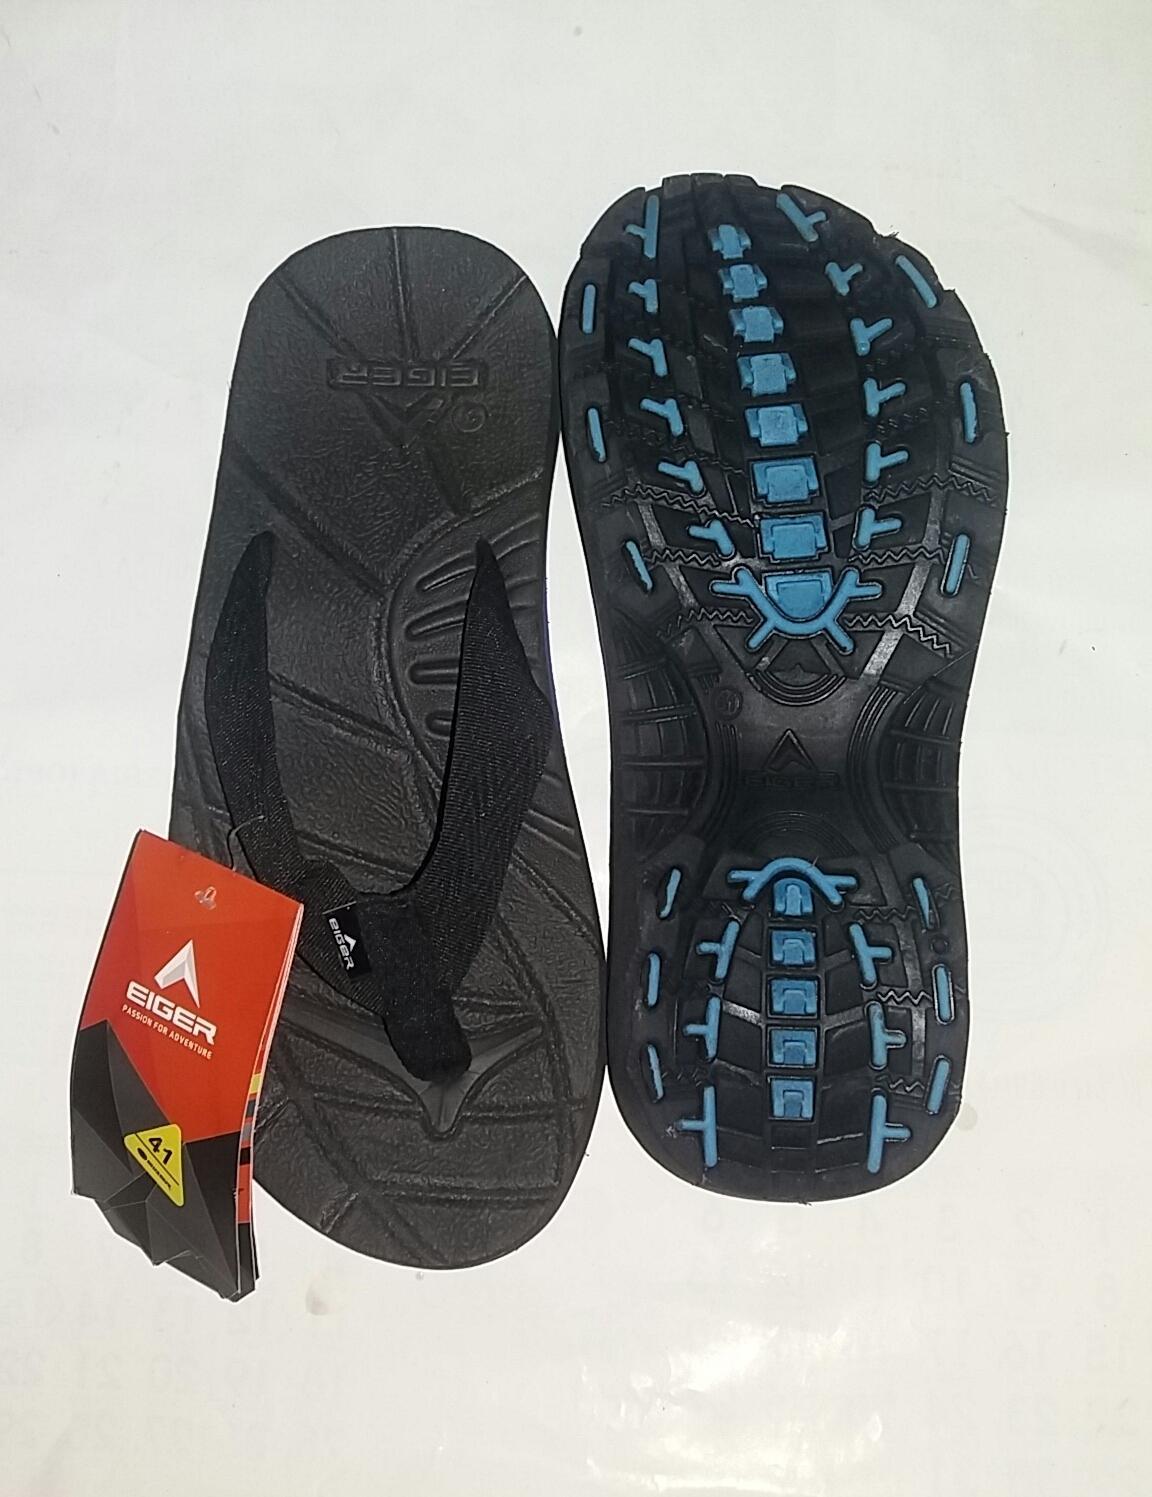 Eiger japit LightSpeed / sandal sendal pria dan wanita